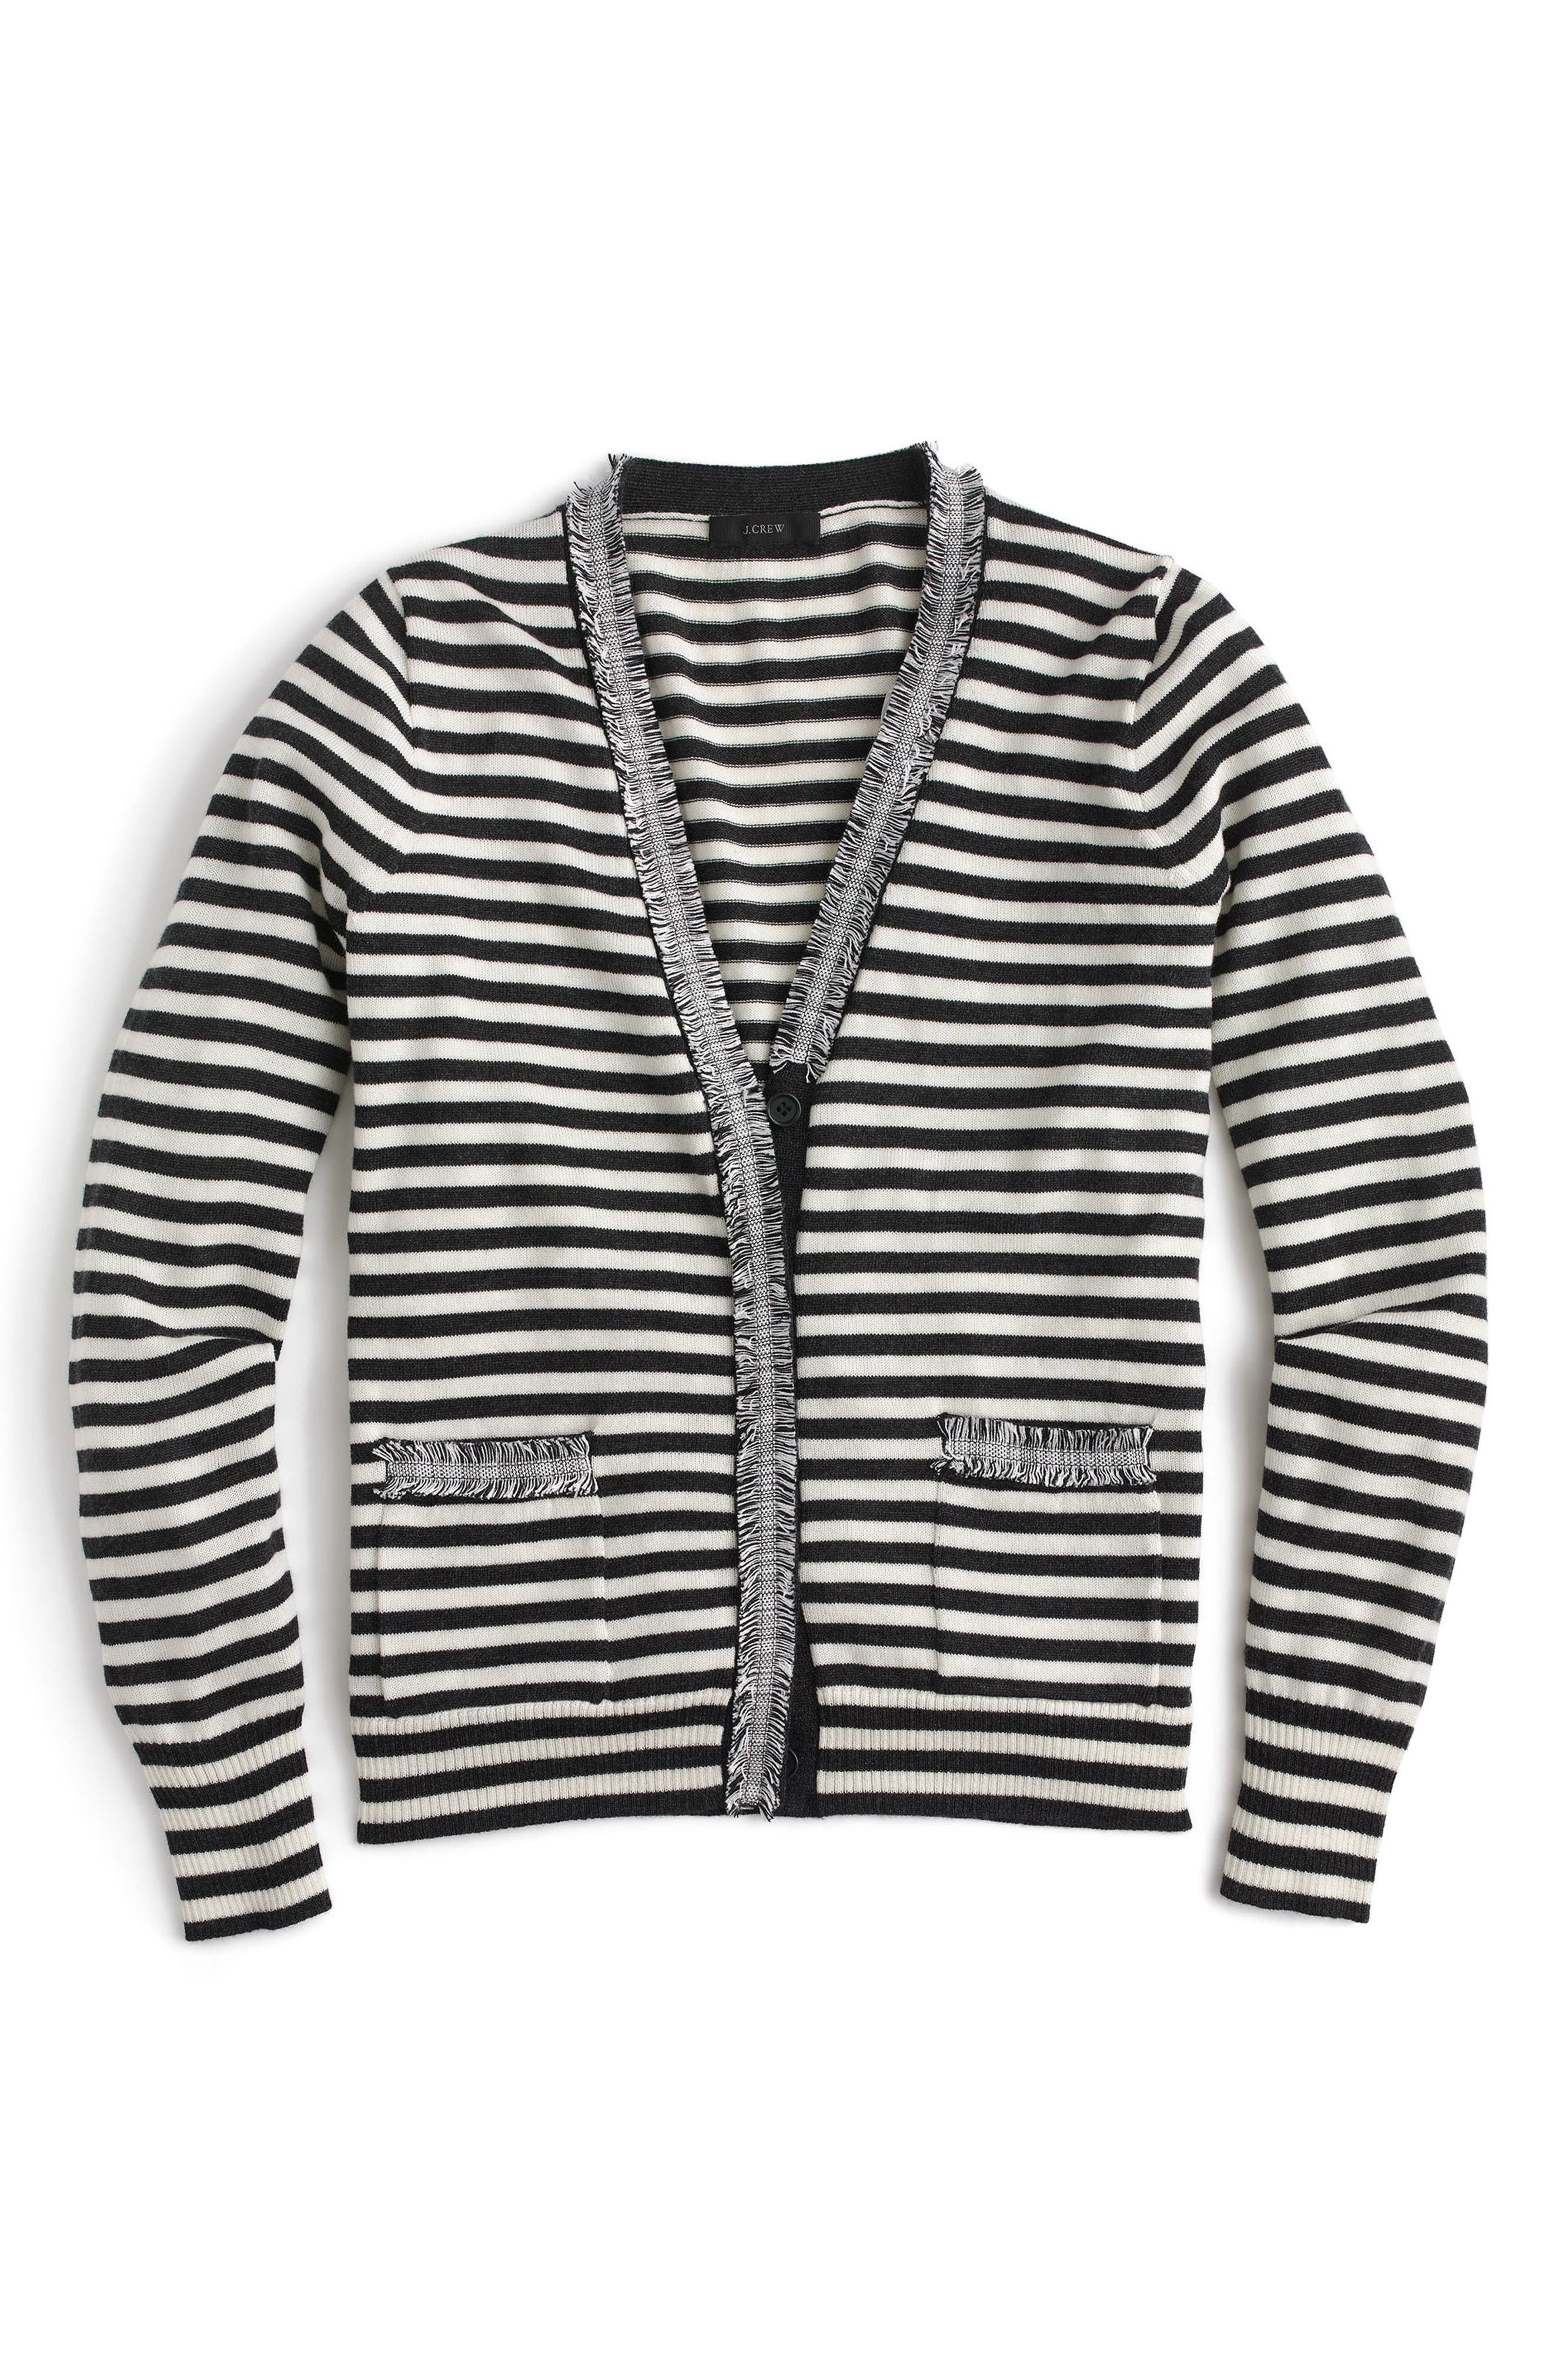 Alternate Image 3  - J.Crew Stripe Harlow Cardigan Sweater